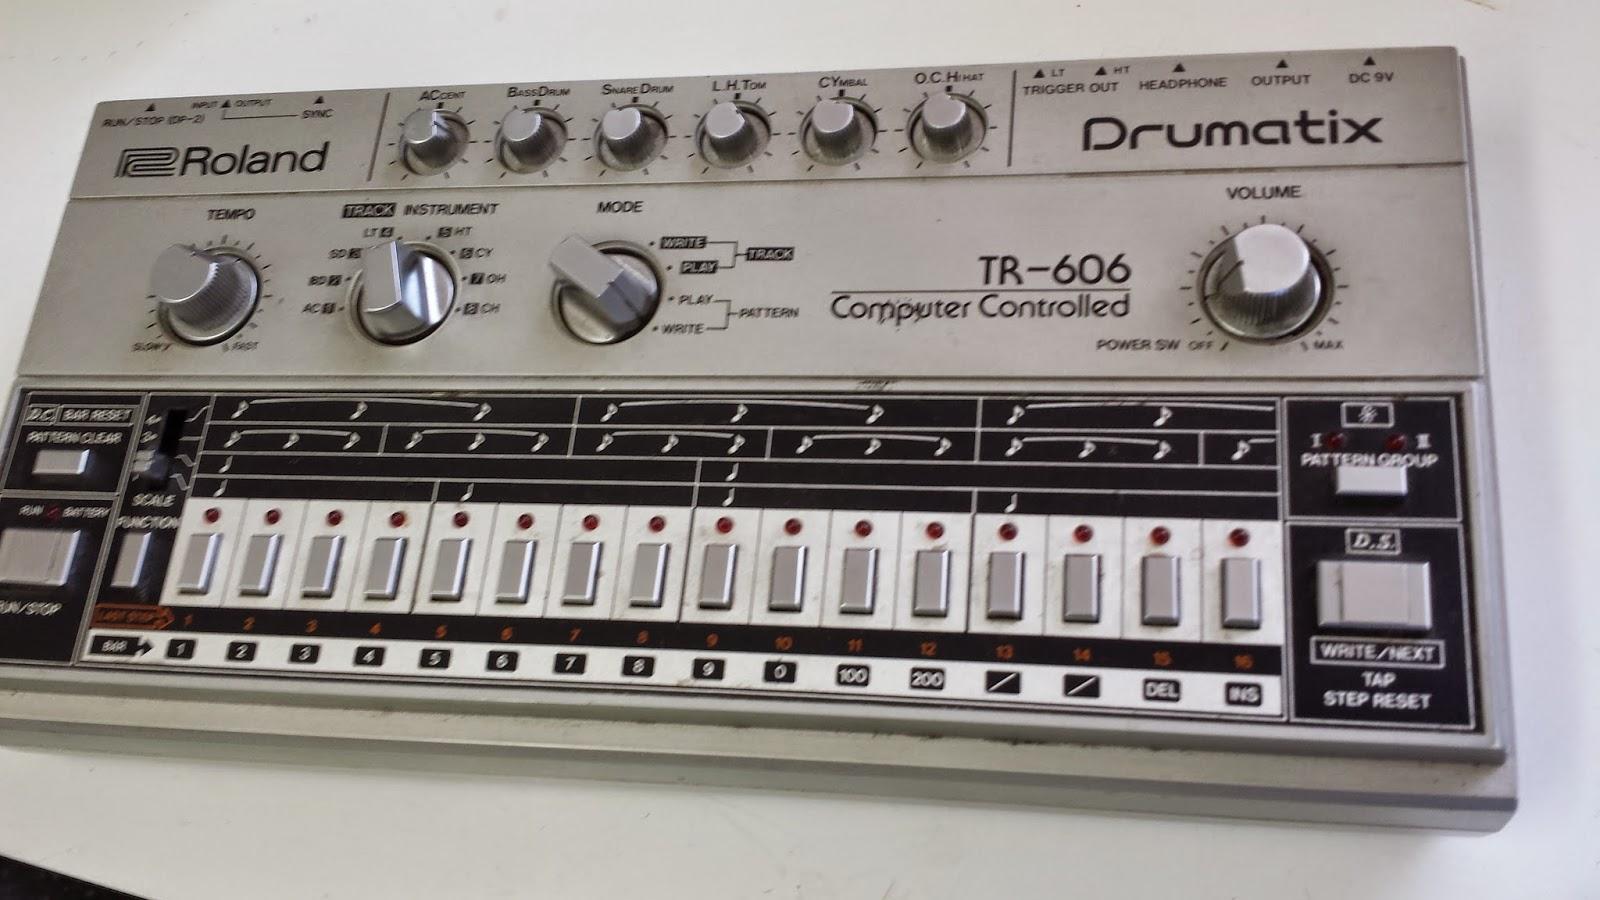 jondent exploring electronic music roland tr 606 drum machine. Black Bedroom Furniture Sets. Home Design Ideas